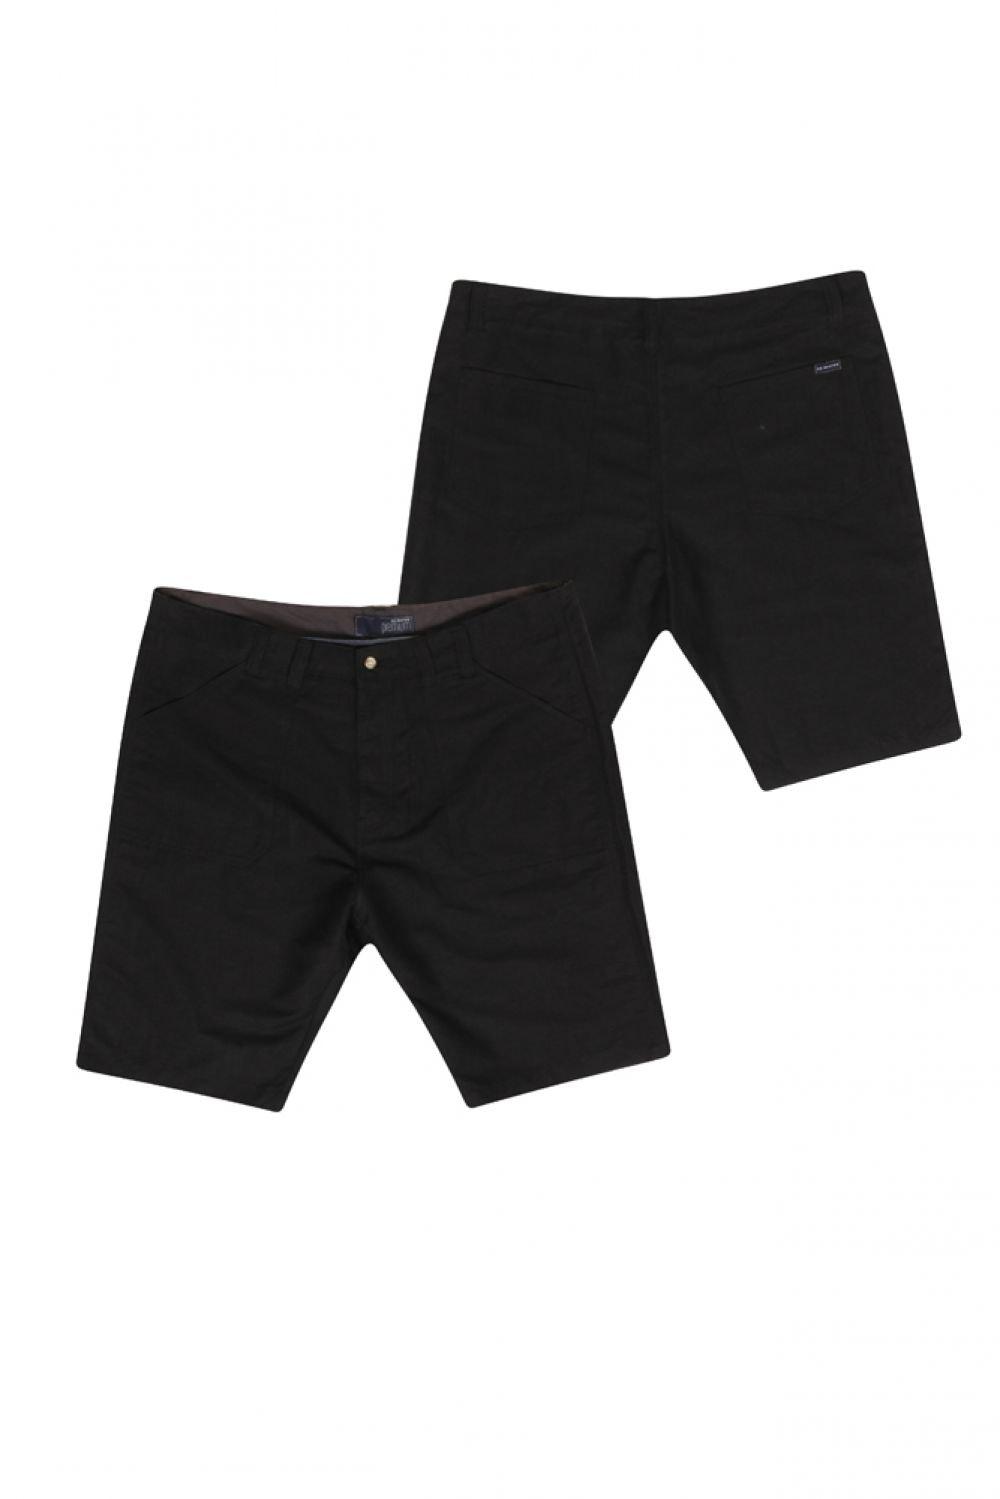 Ed Baxter Alba Linen Shorts